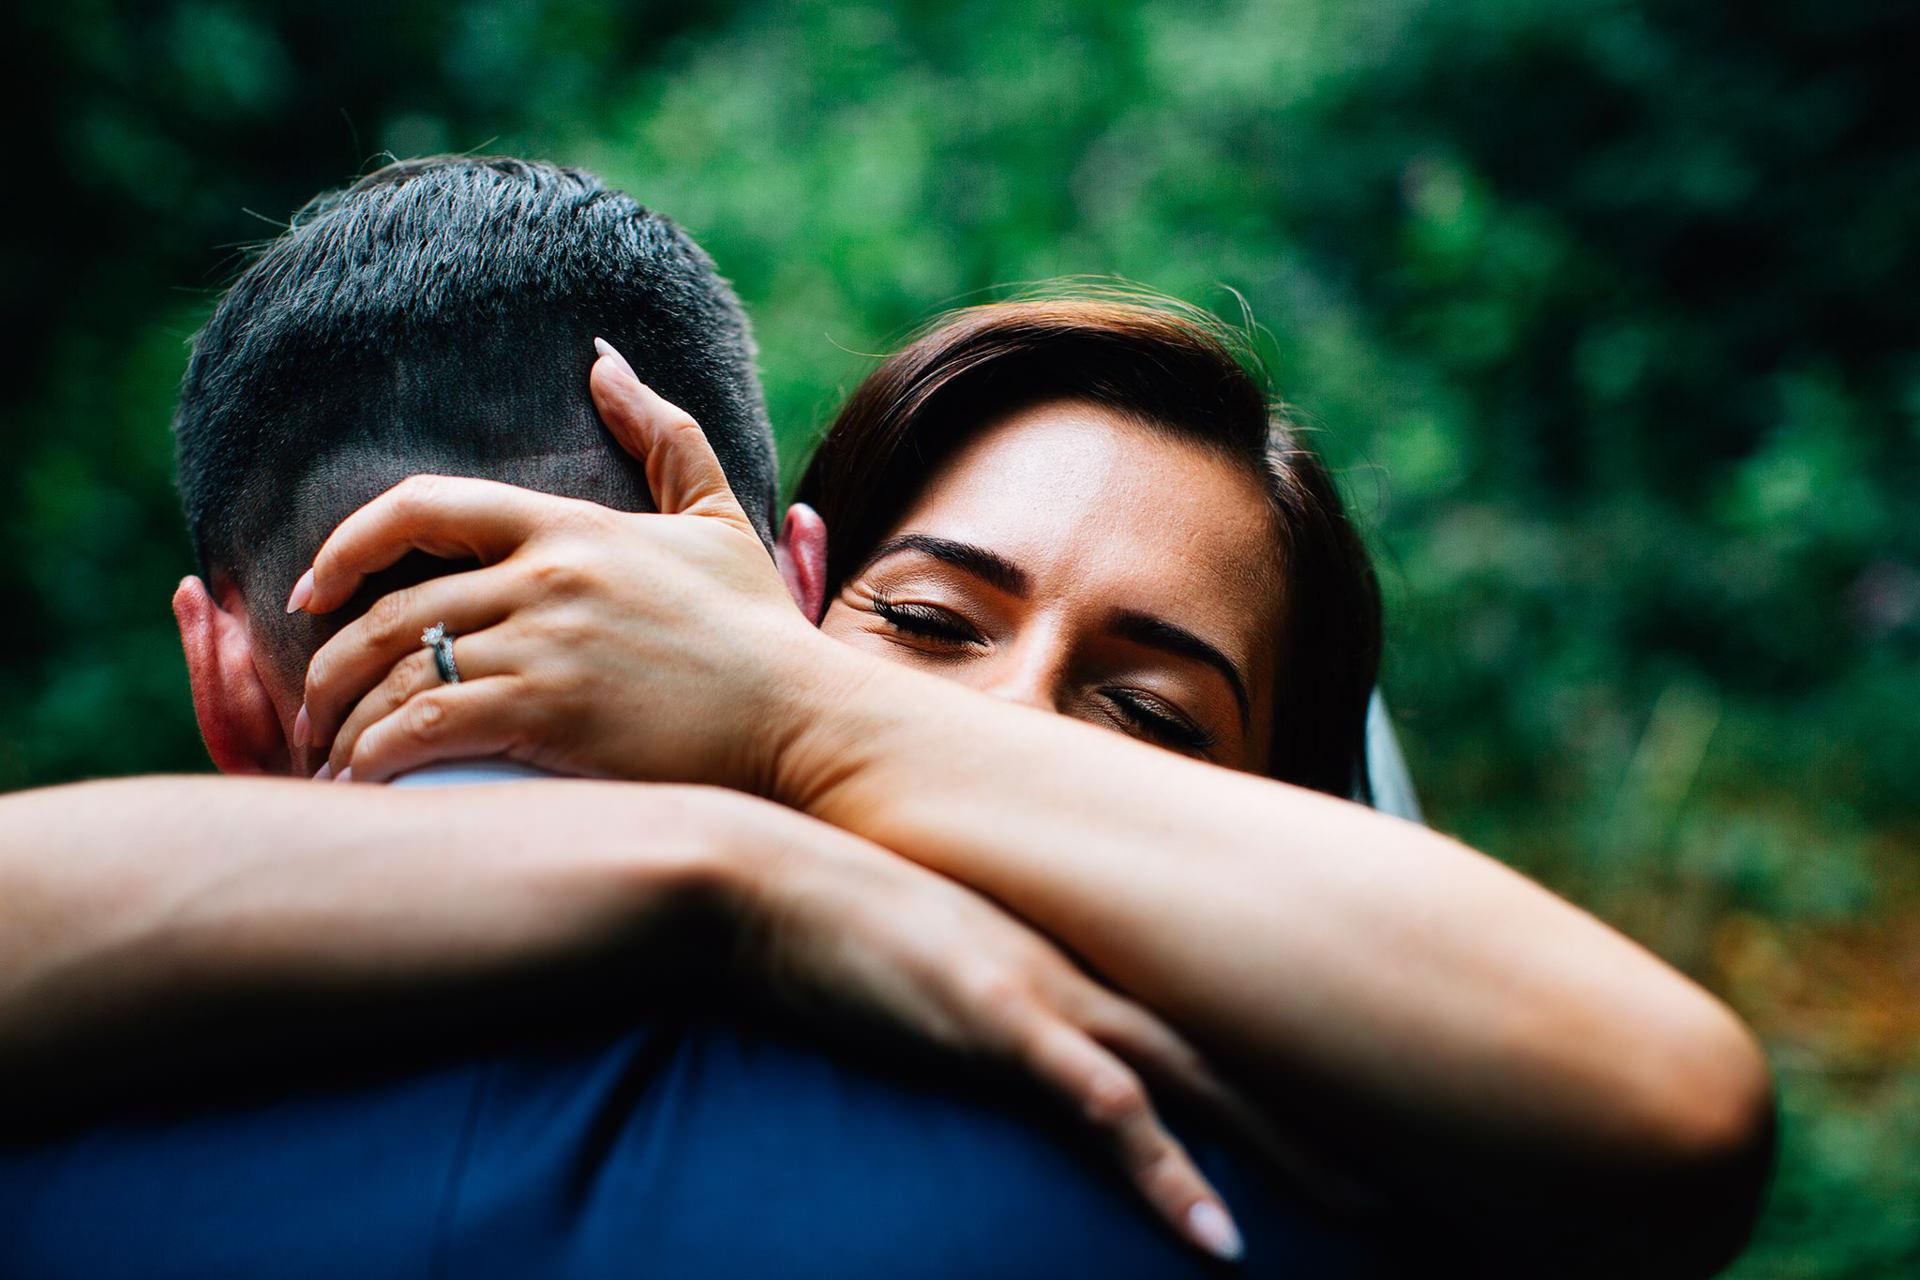 Creative Documentary Wedding Photographer UK and Destination - brides face hugging groom